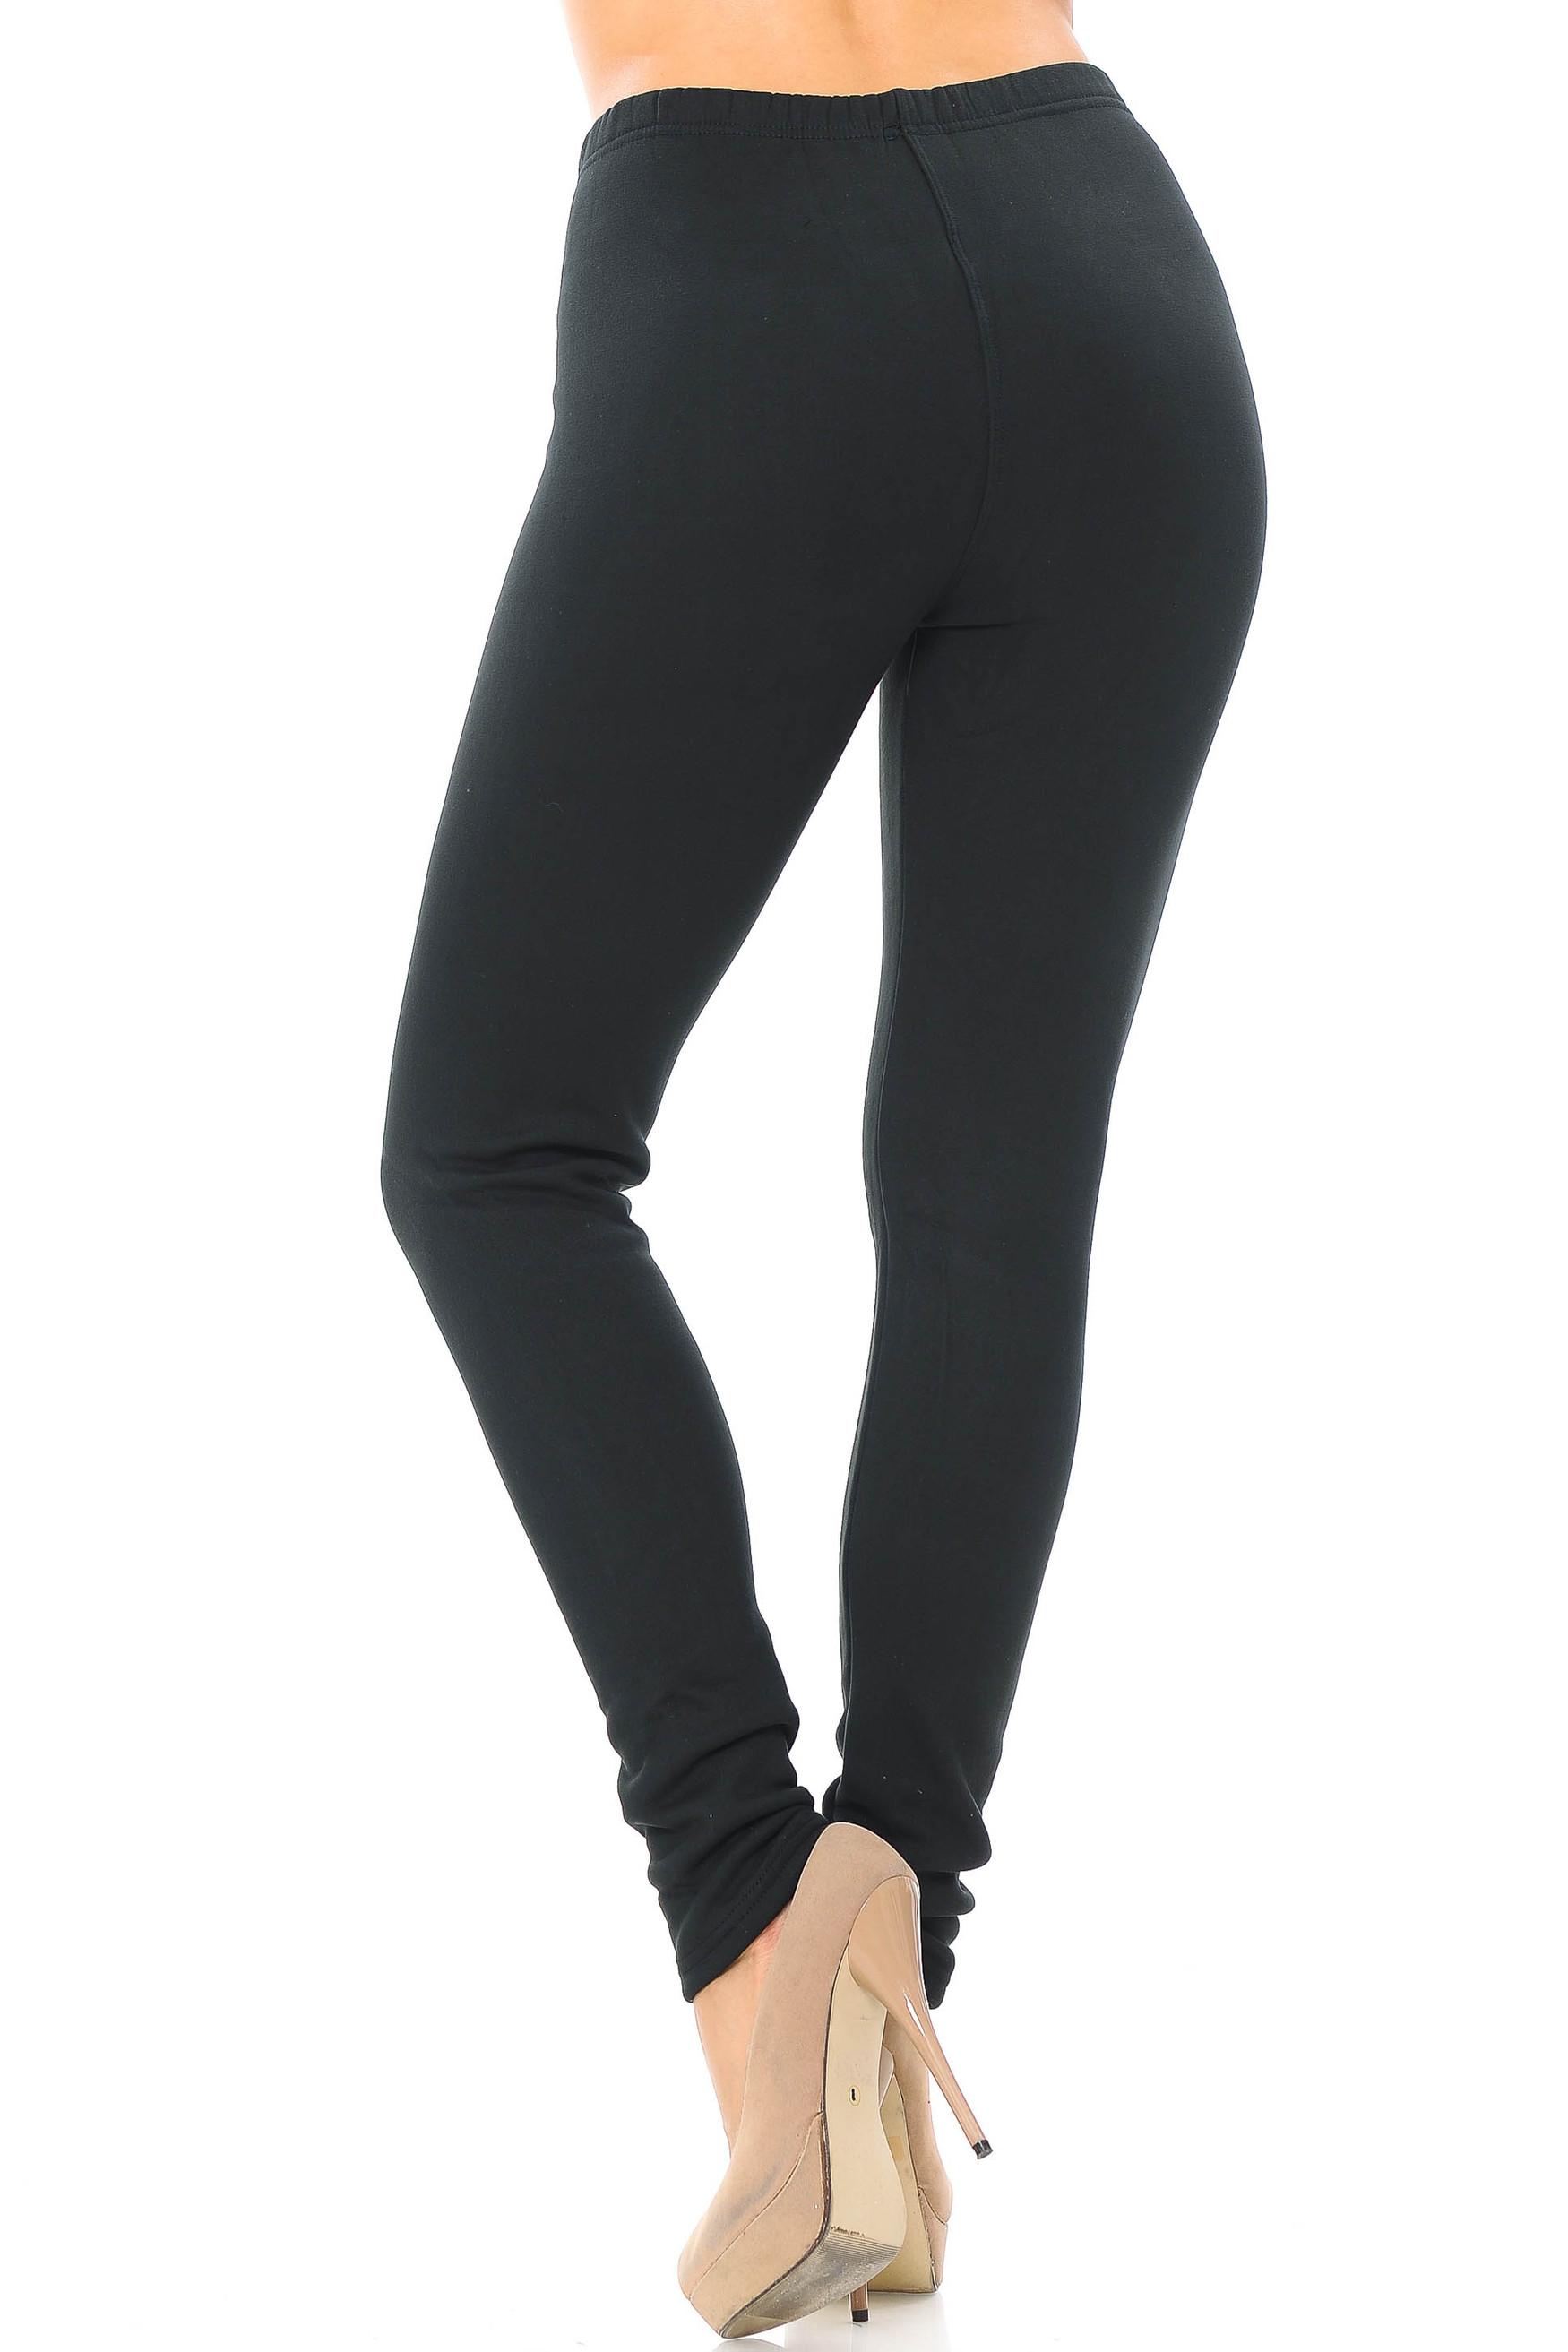 Back side image of Creamy Soft Fleece Lined Leggings - USA Fashion™